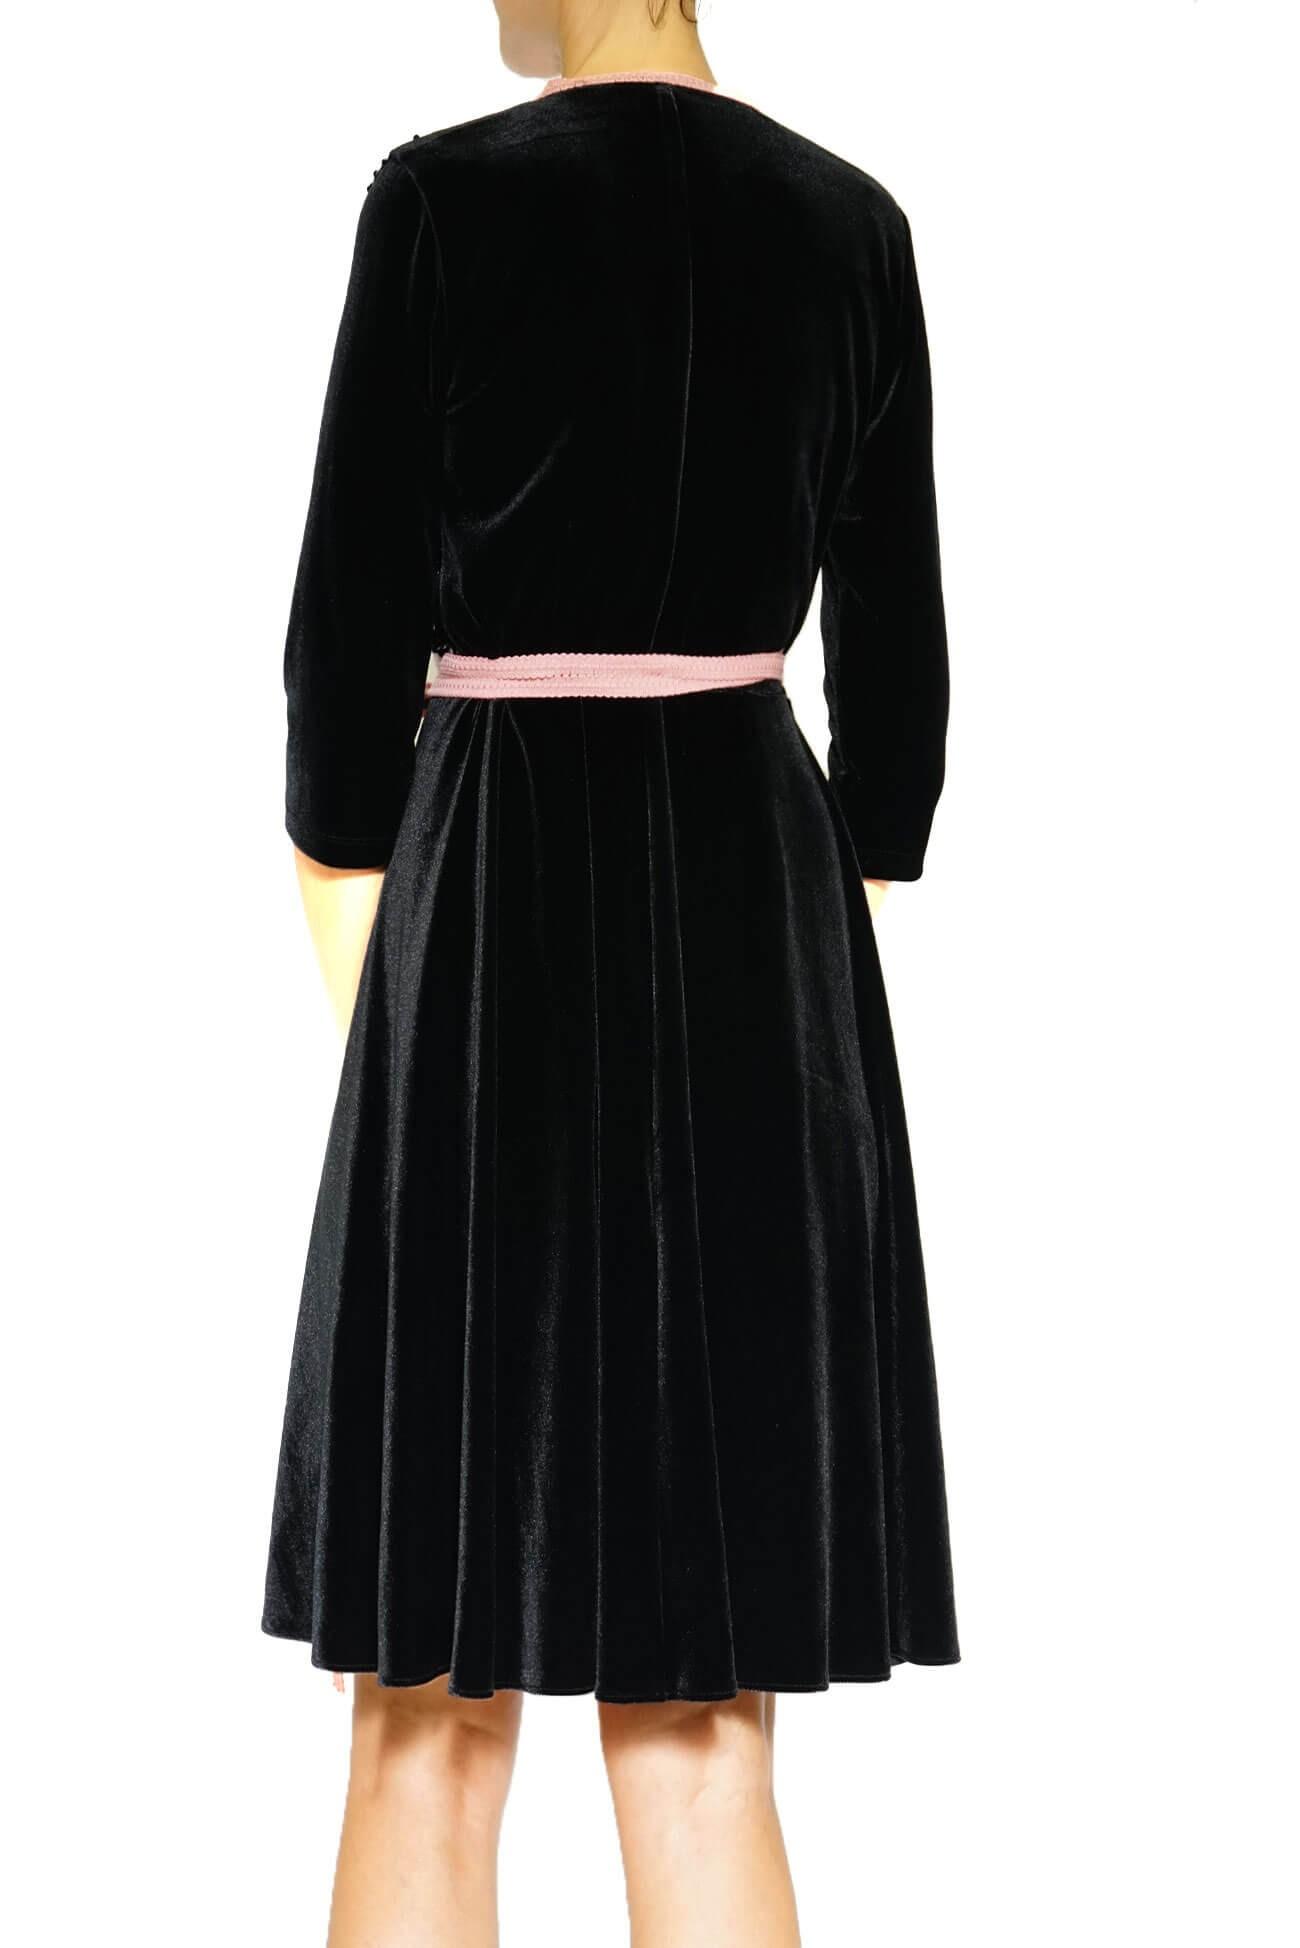 Rochie petrecuta din catifea neagra